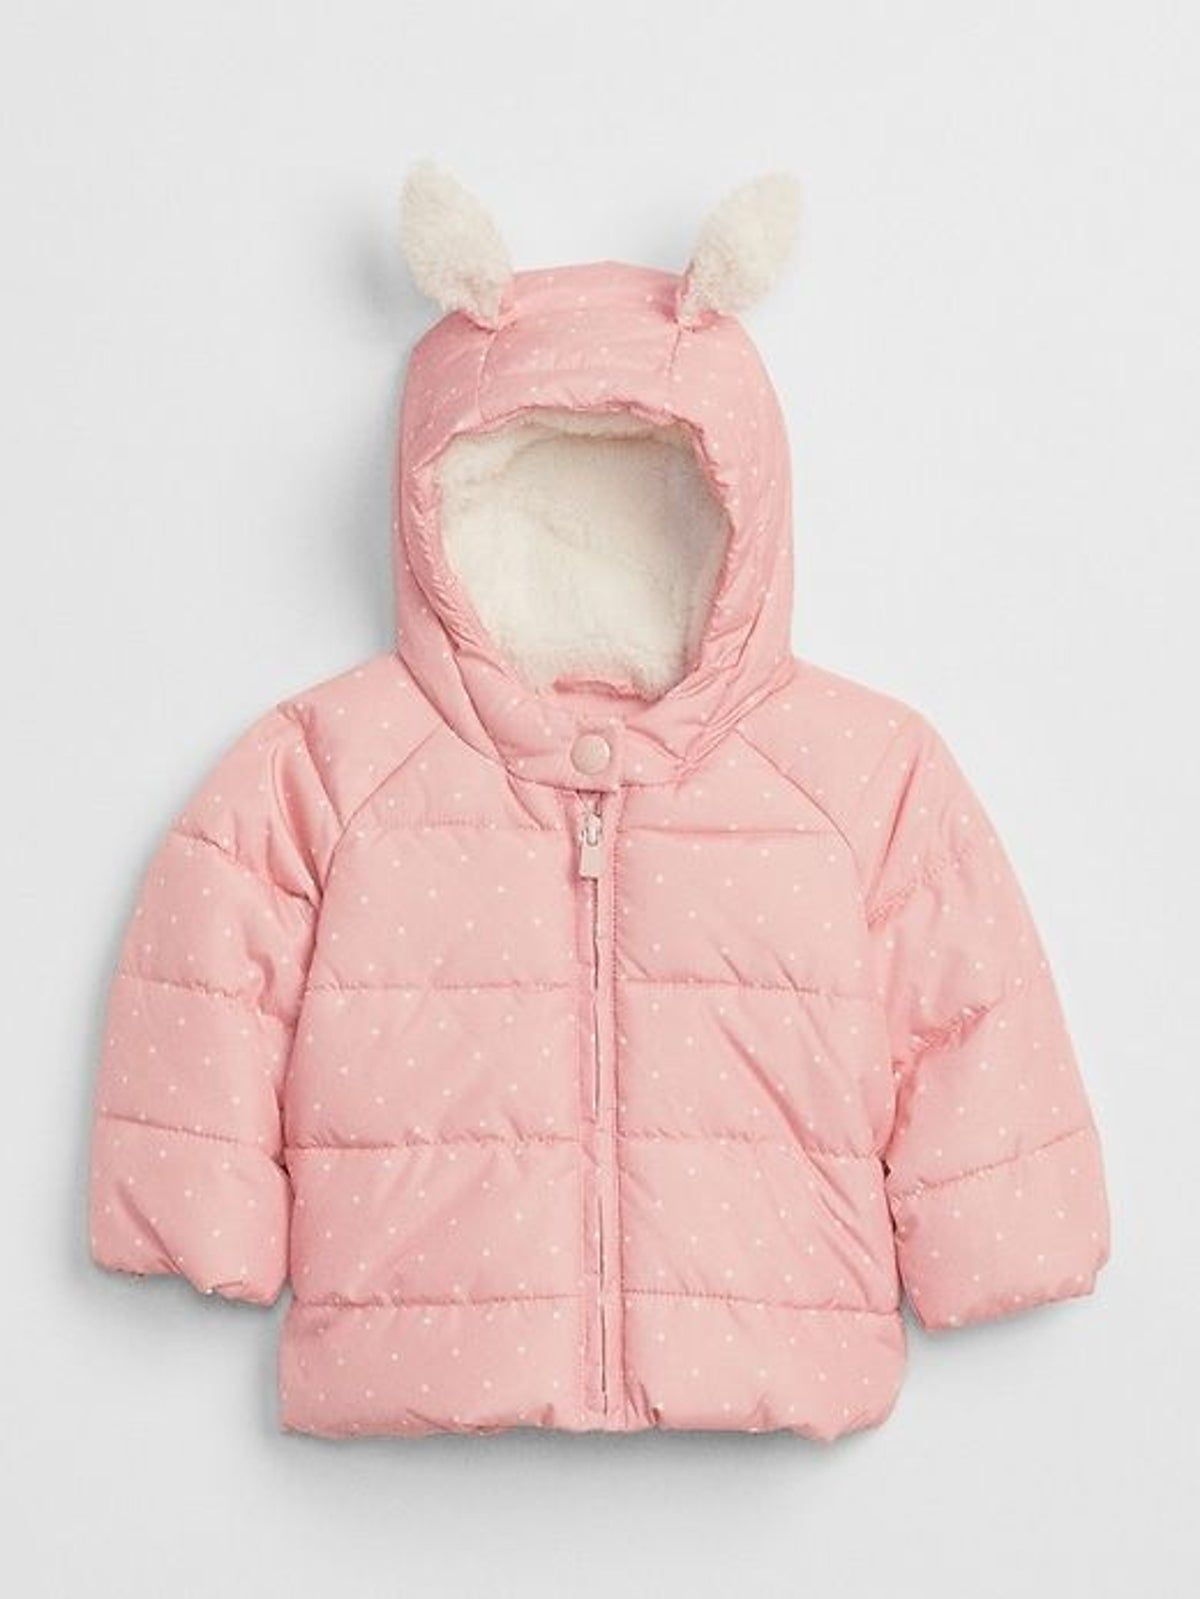 Baby Gap Girls Pink Puffer Jacket Winter In 2021 Baby Gap Girl Baby Girl Clothes Girls Clothes Shops [ 1599 x 1200 Pixel ]